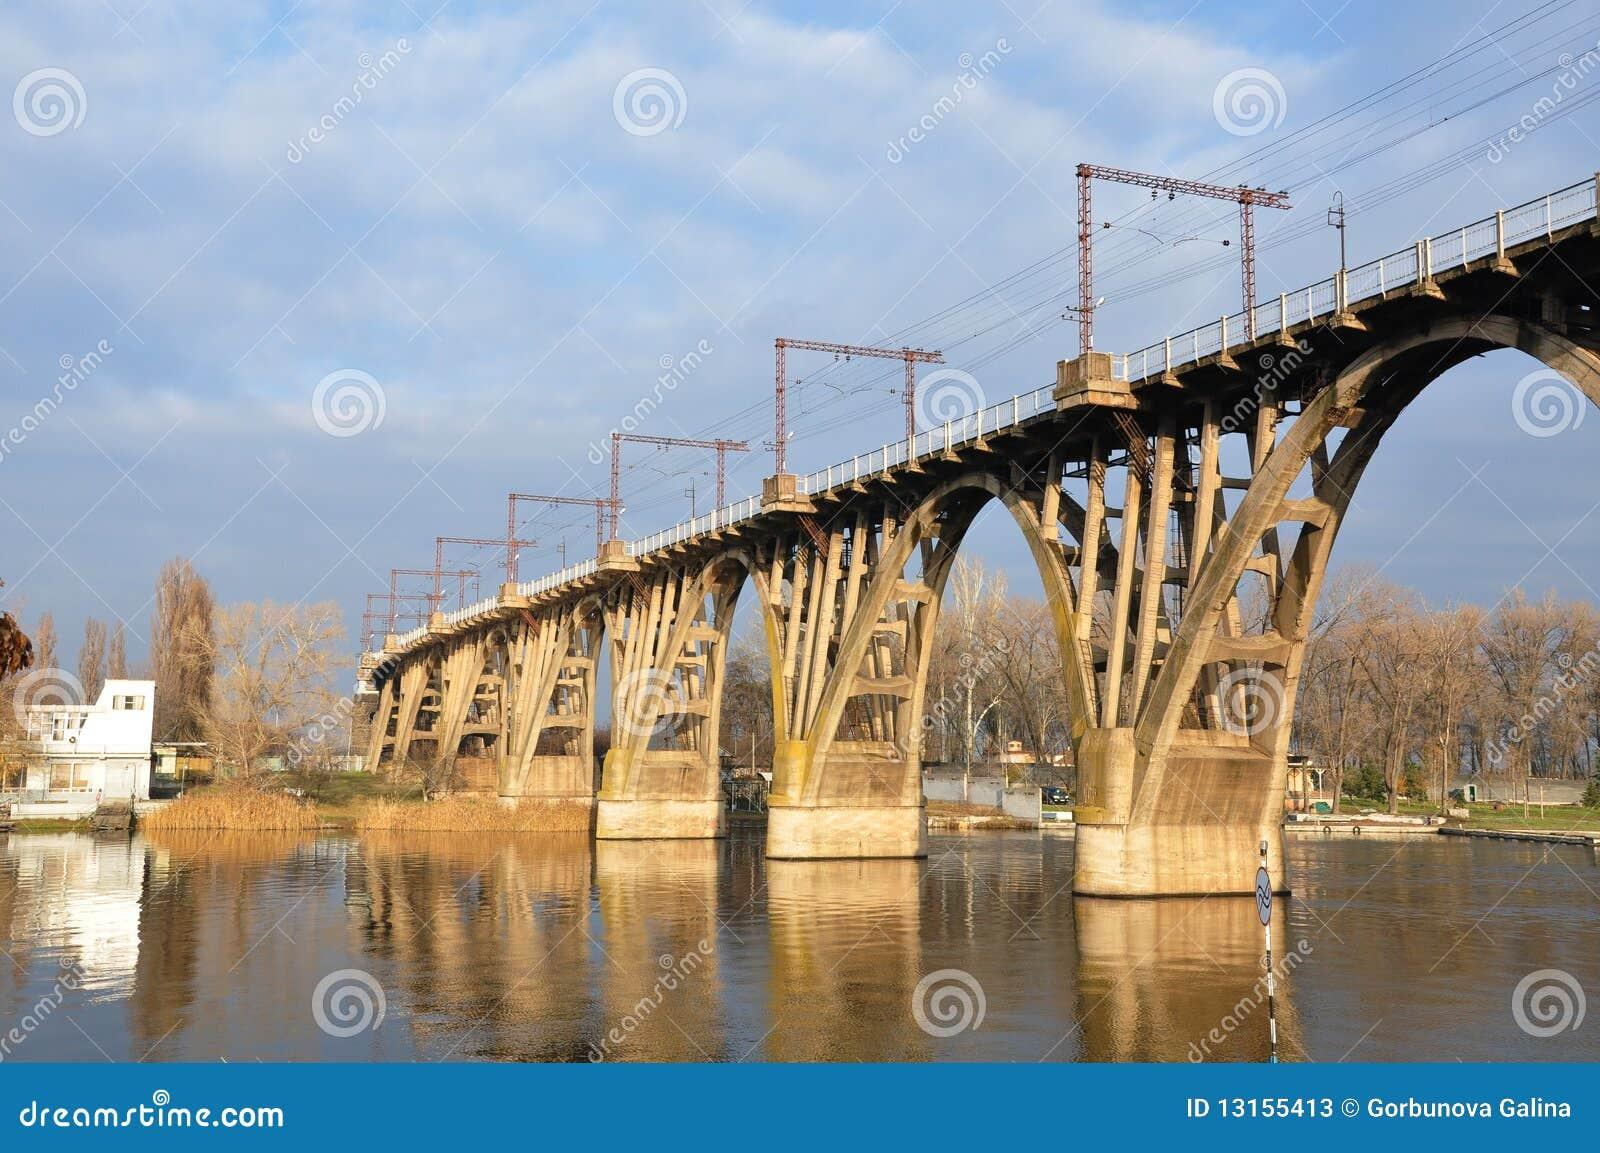 Ucraina città dniepropetovsk fiume dnepr mr no pr no 0 541 0